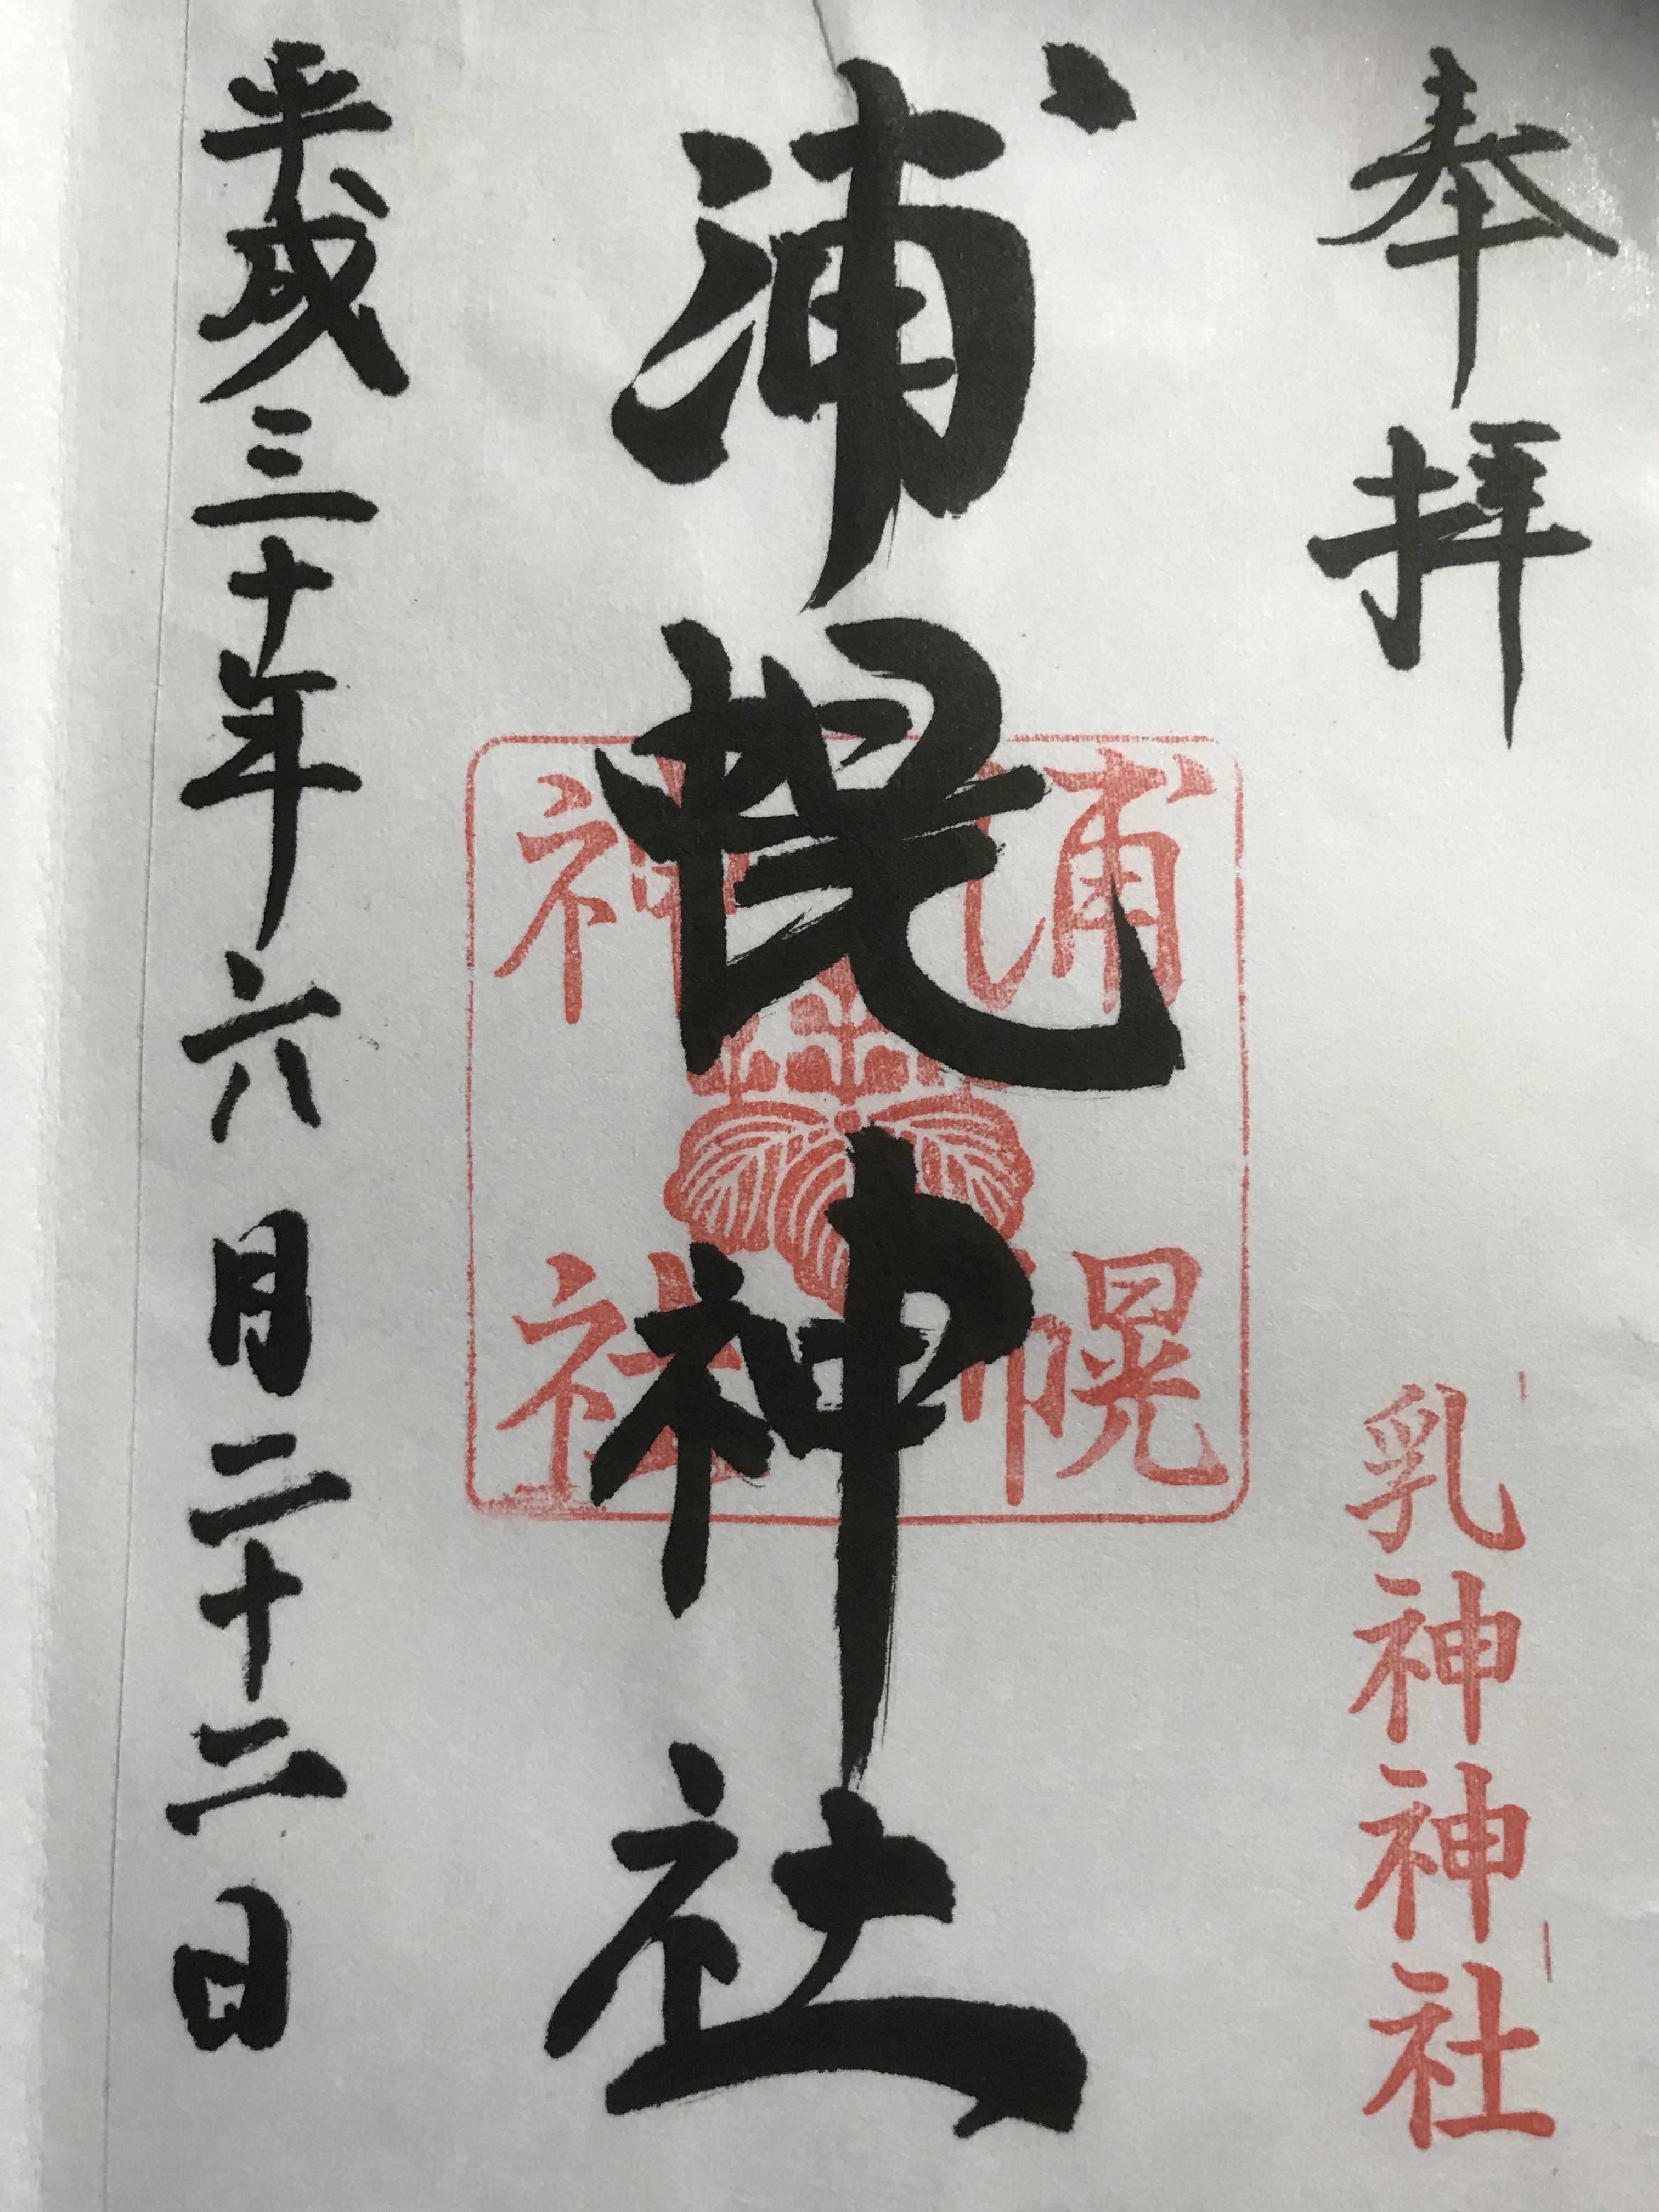 浦幌神社の御朱印